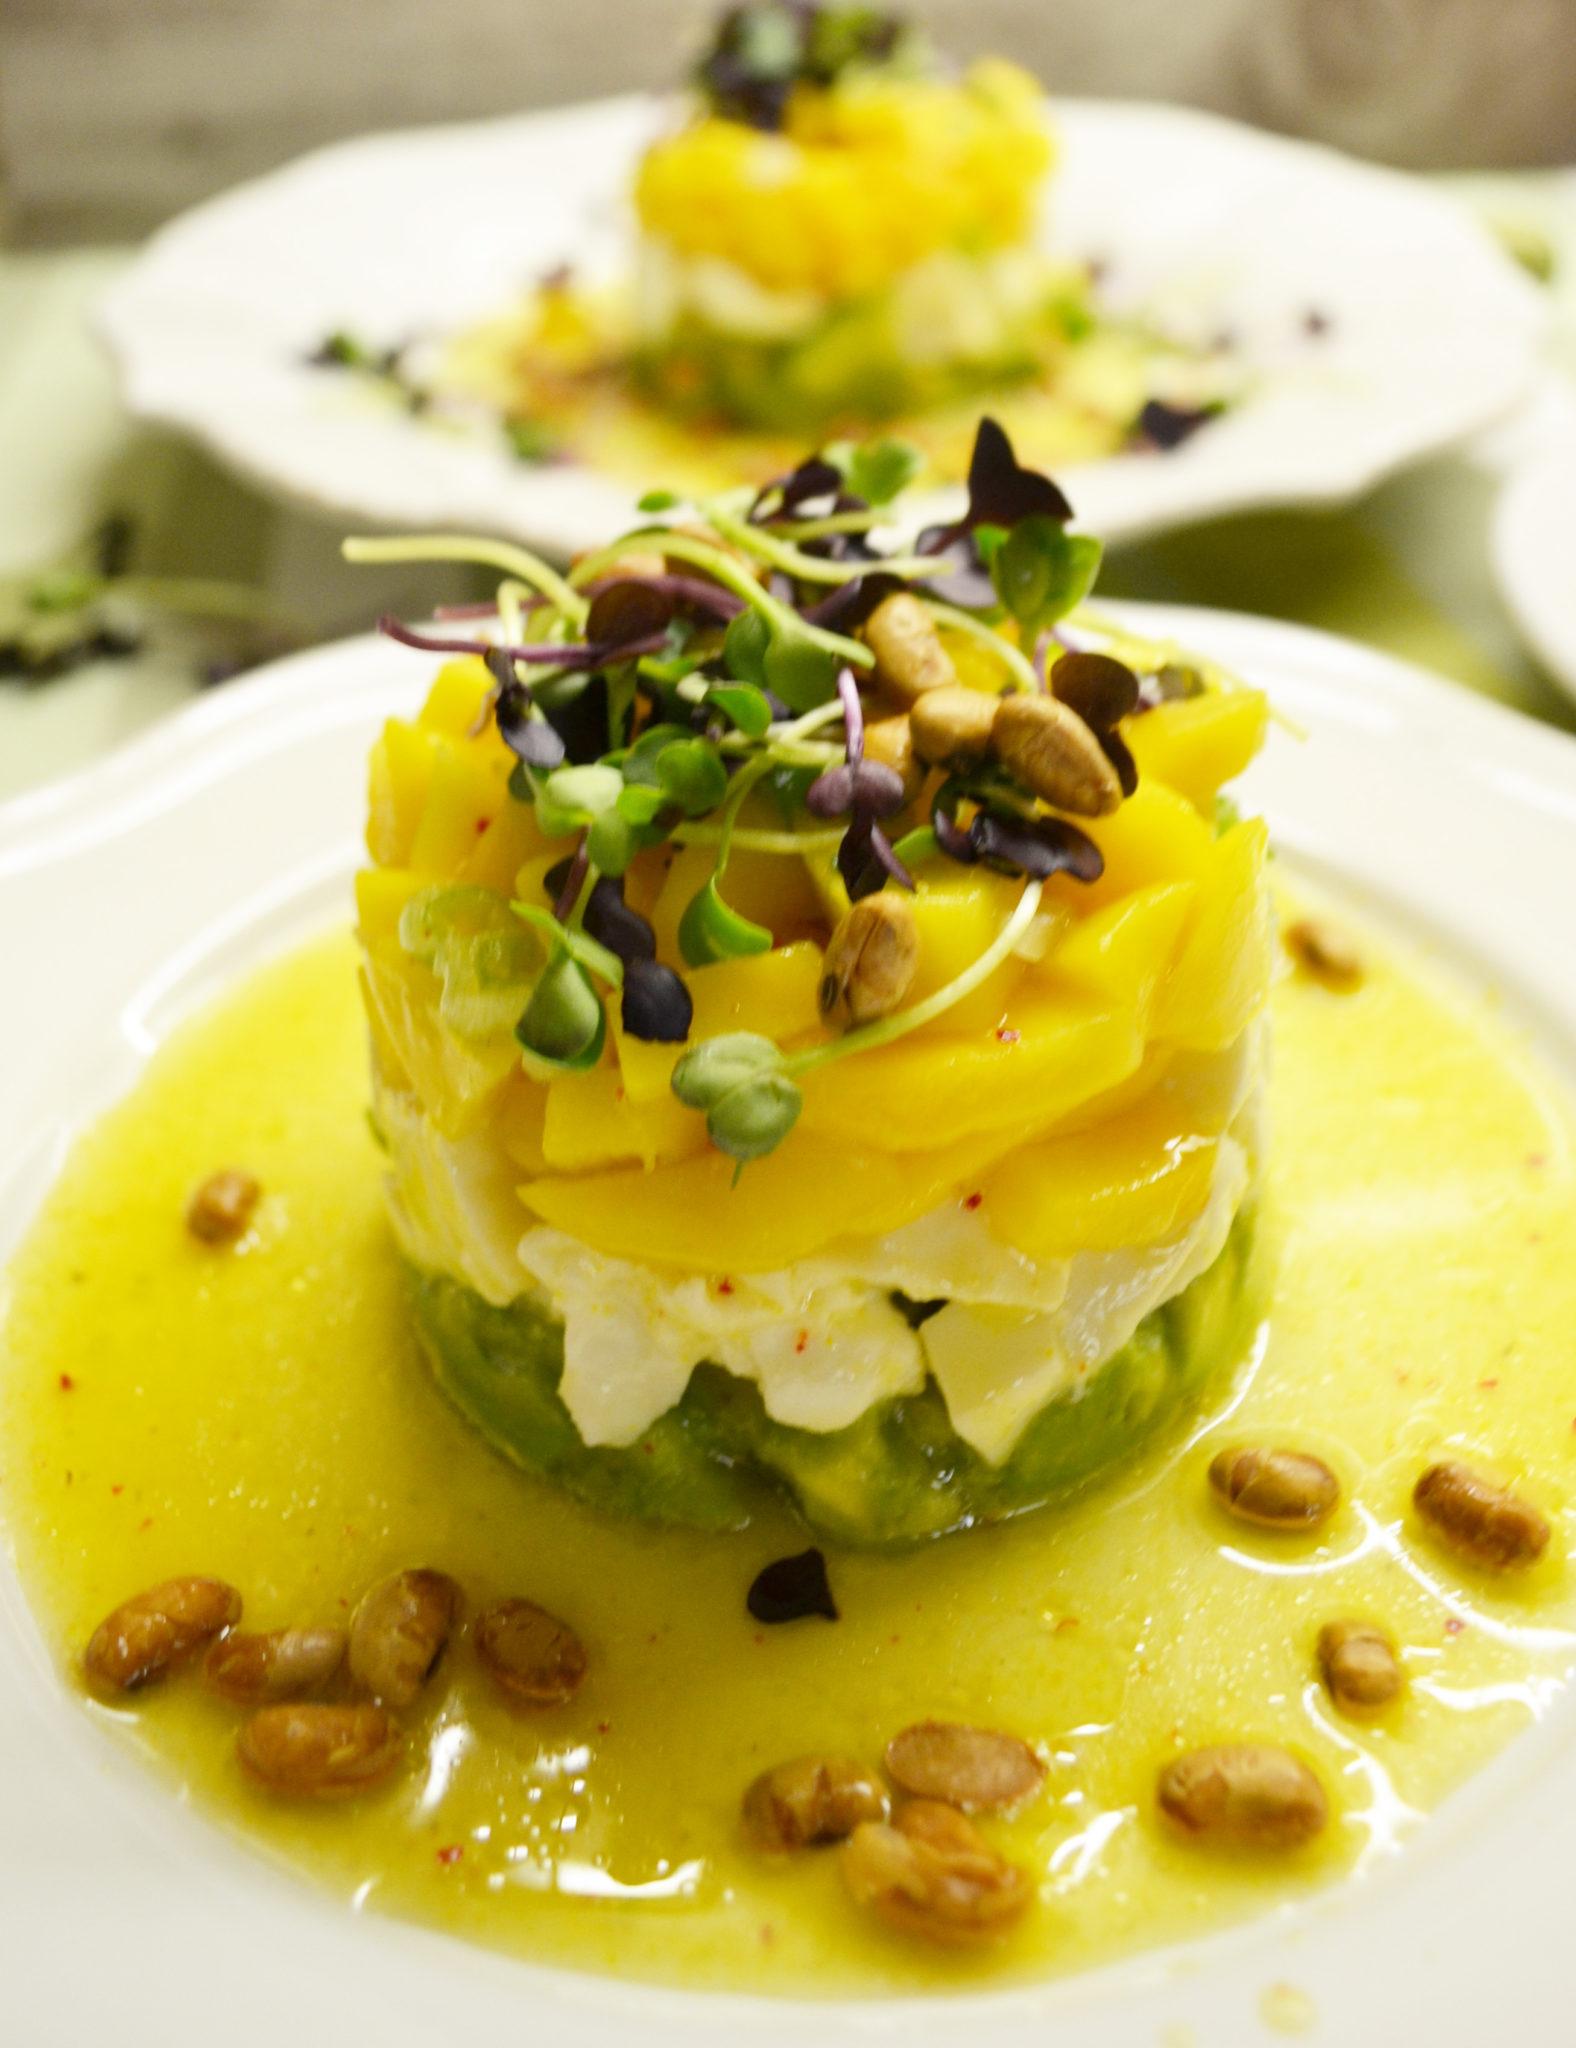 Frisches Türmchen! Avocado-Mozzarella-Mango-Salat mit Orangenvinaigrette